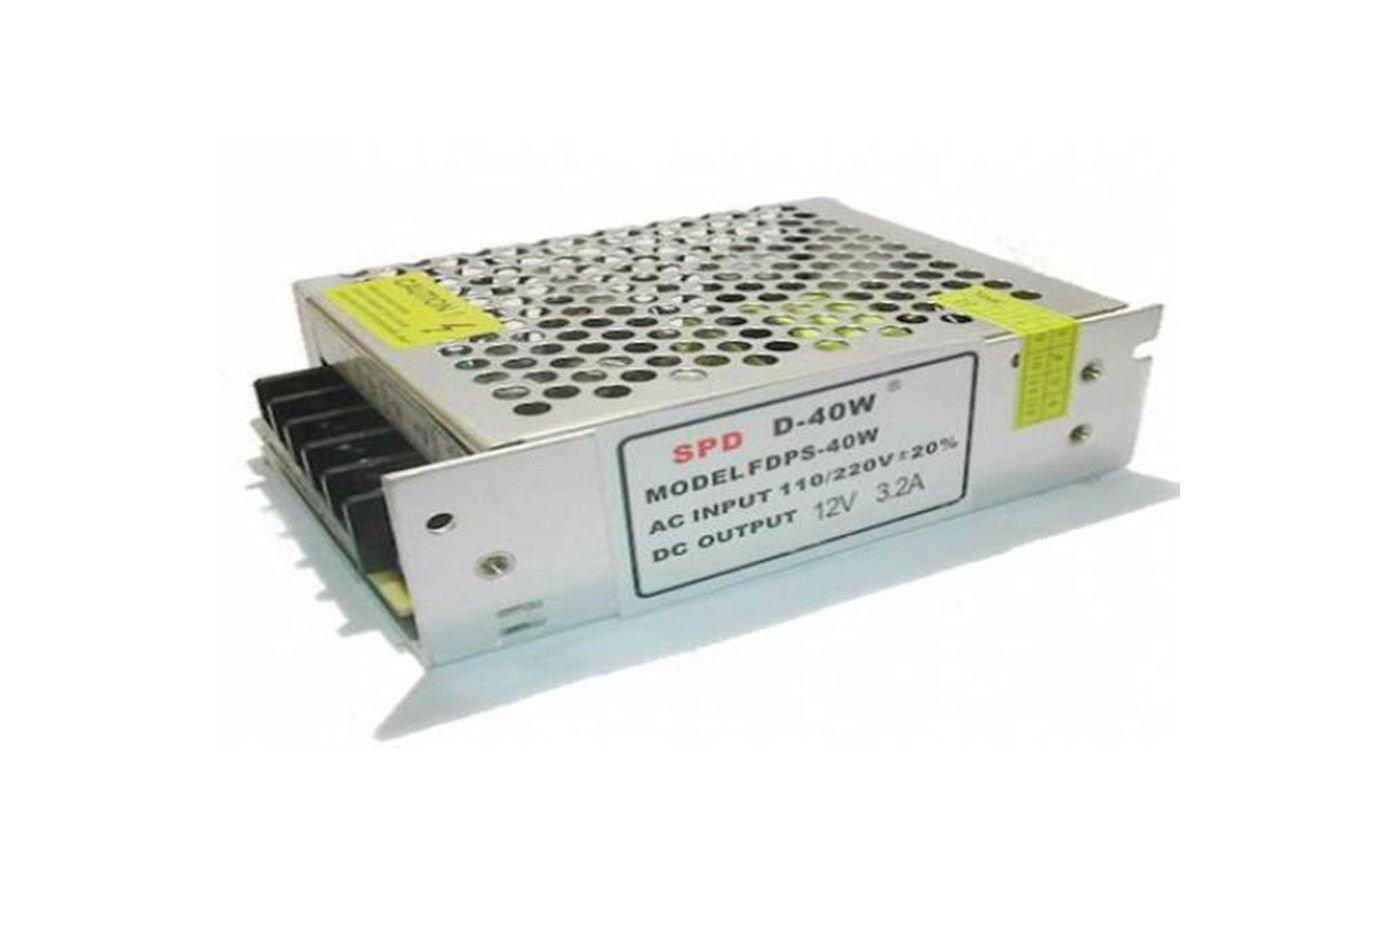 Transformateur stabilisé pour bande LED 5050 ou 3528 220V 12V 3 A Led Leds